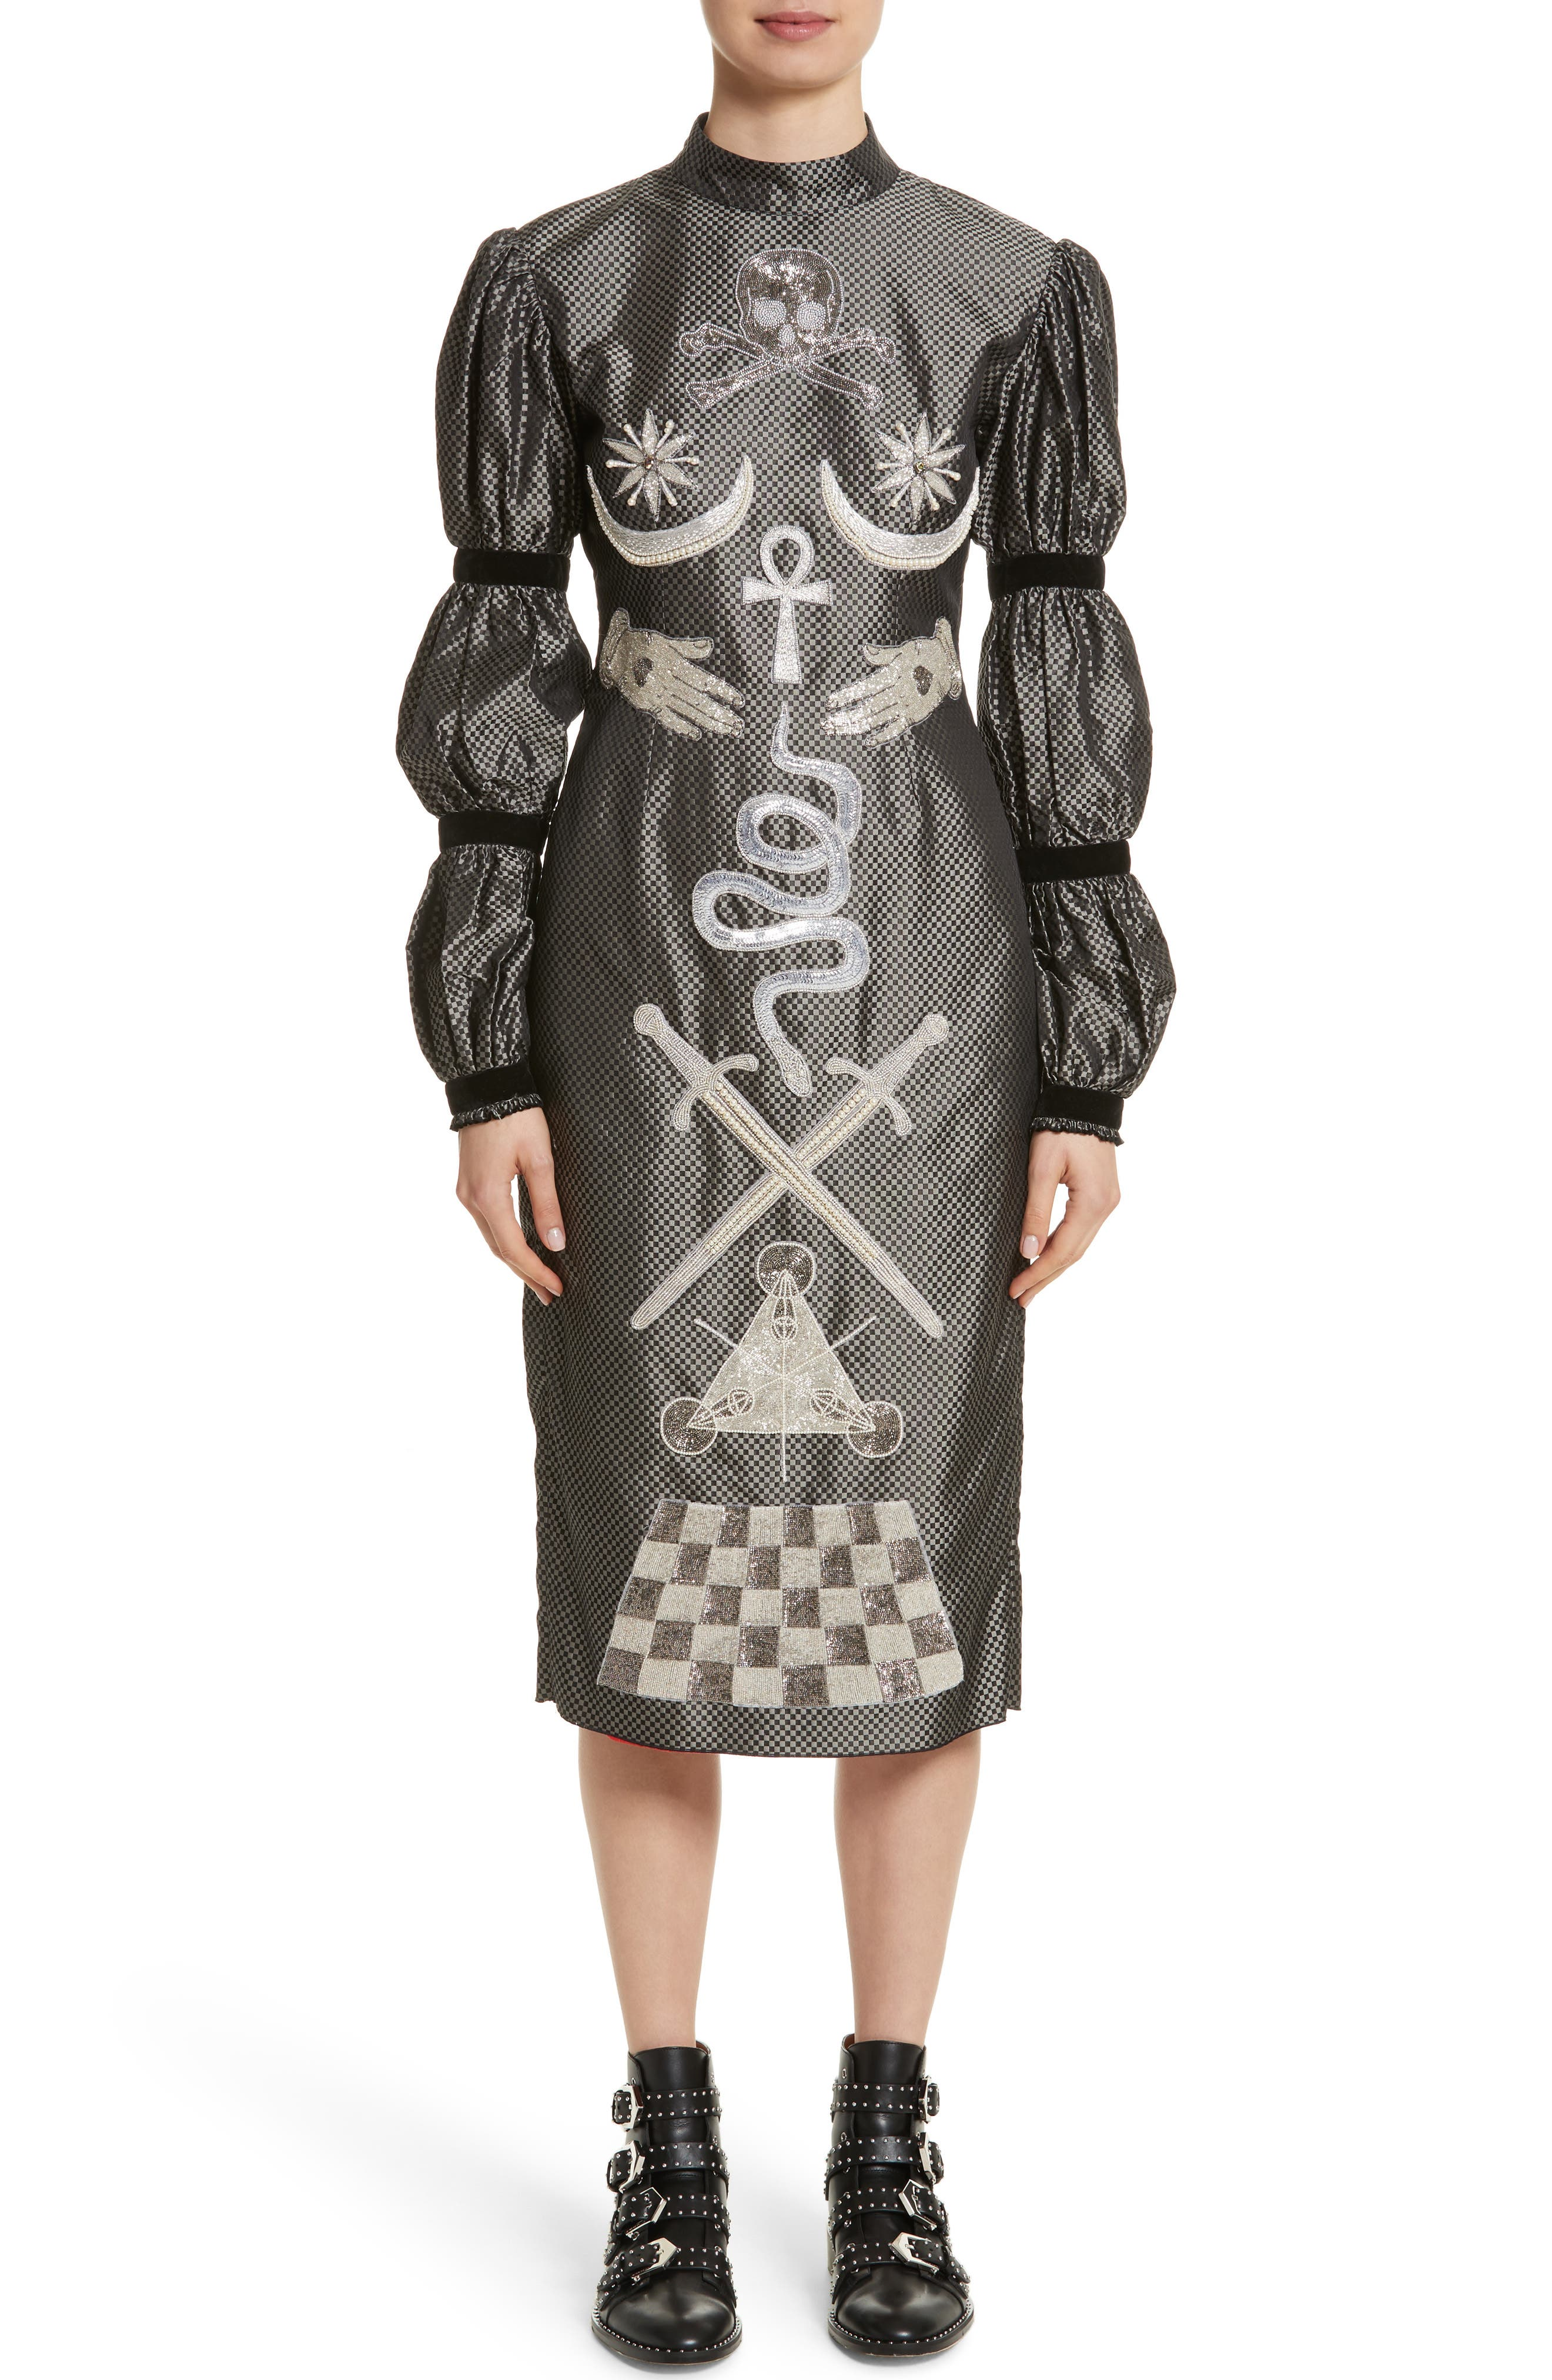 Dilara Findikoglu Alien Goddess Embellished Silk Dress